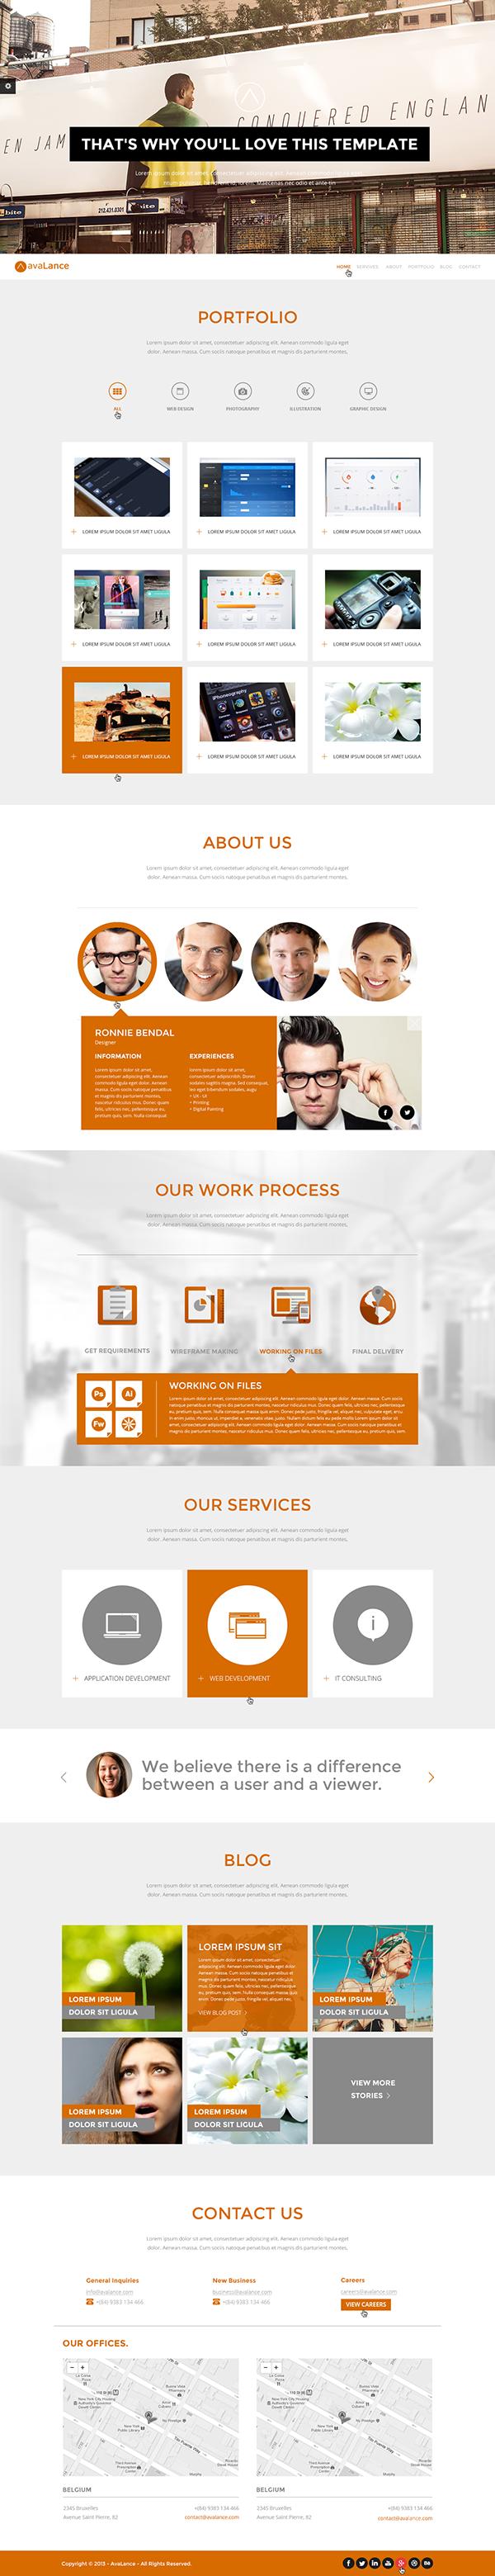 avalance clean creative portfolio template on behance